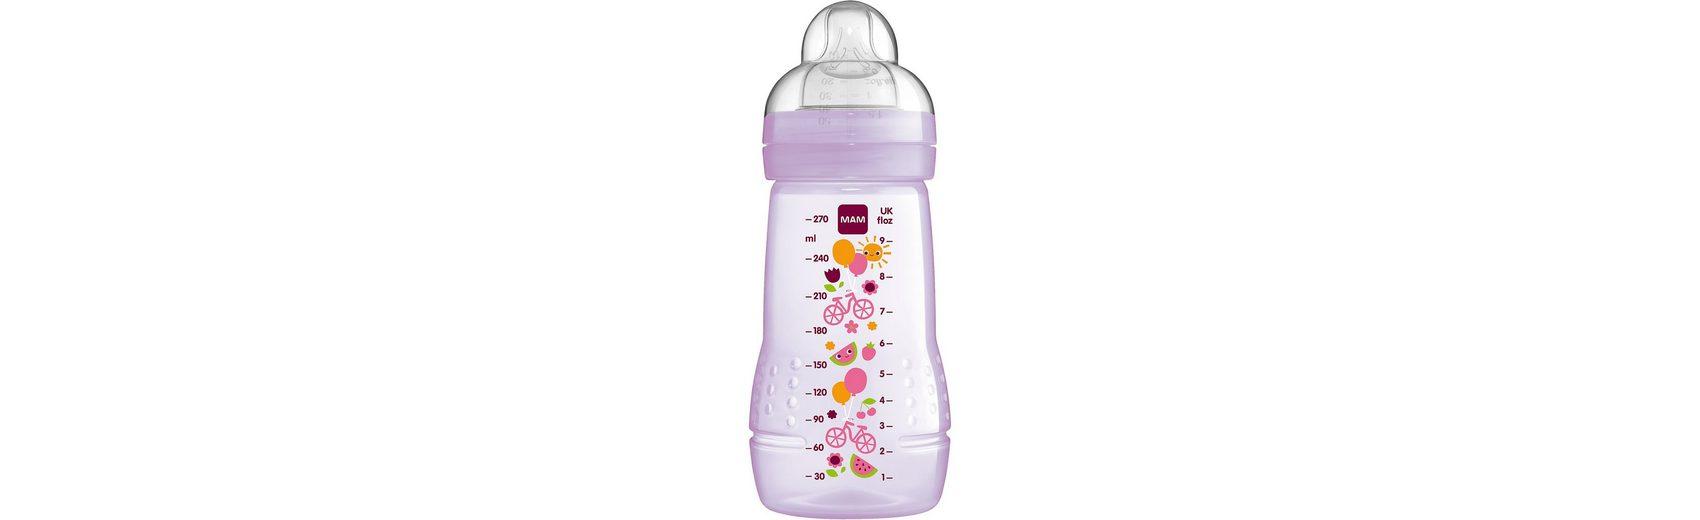 MAM Weithals Flasche Easy Active Baby Bottle, PP, 270 ml, Siliko